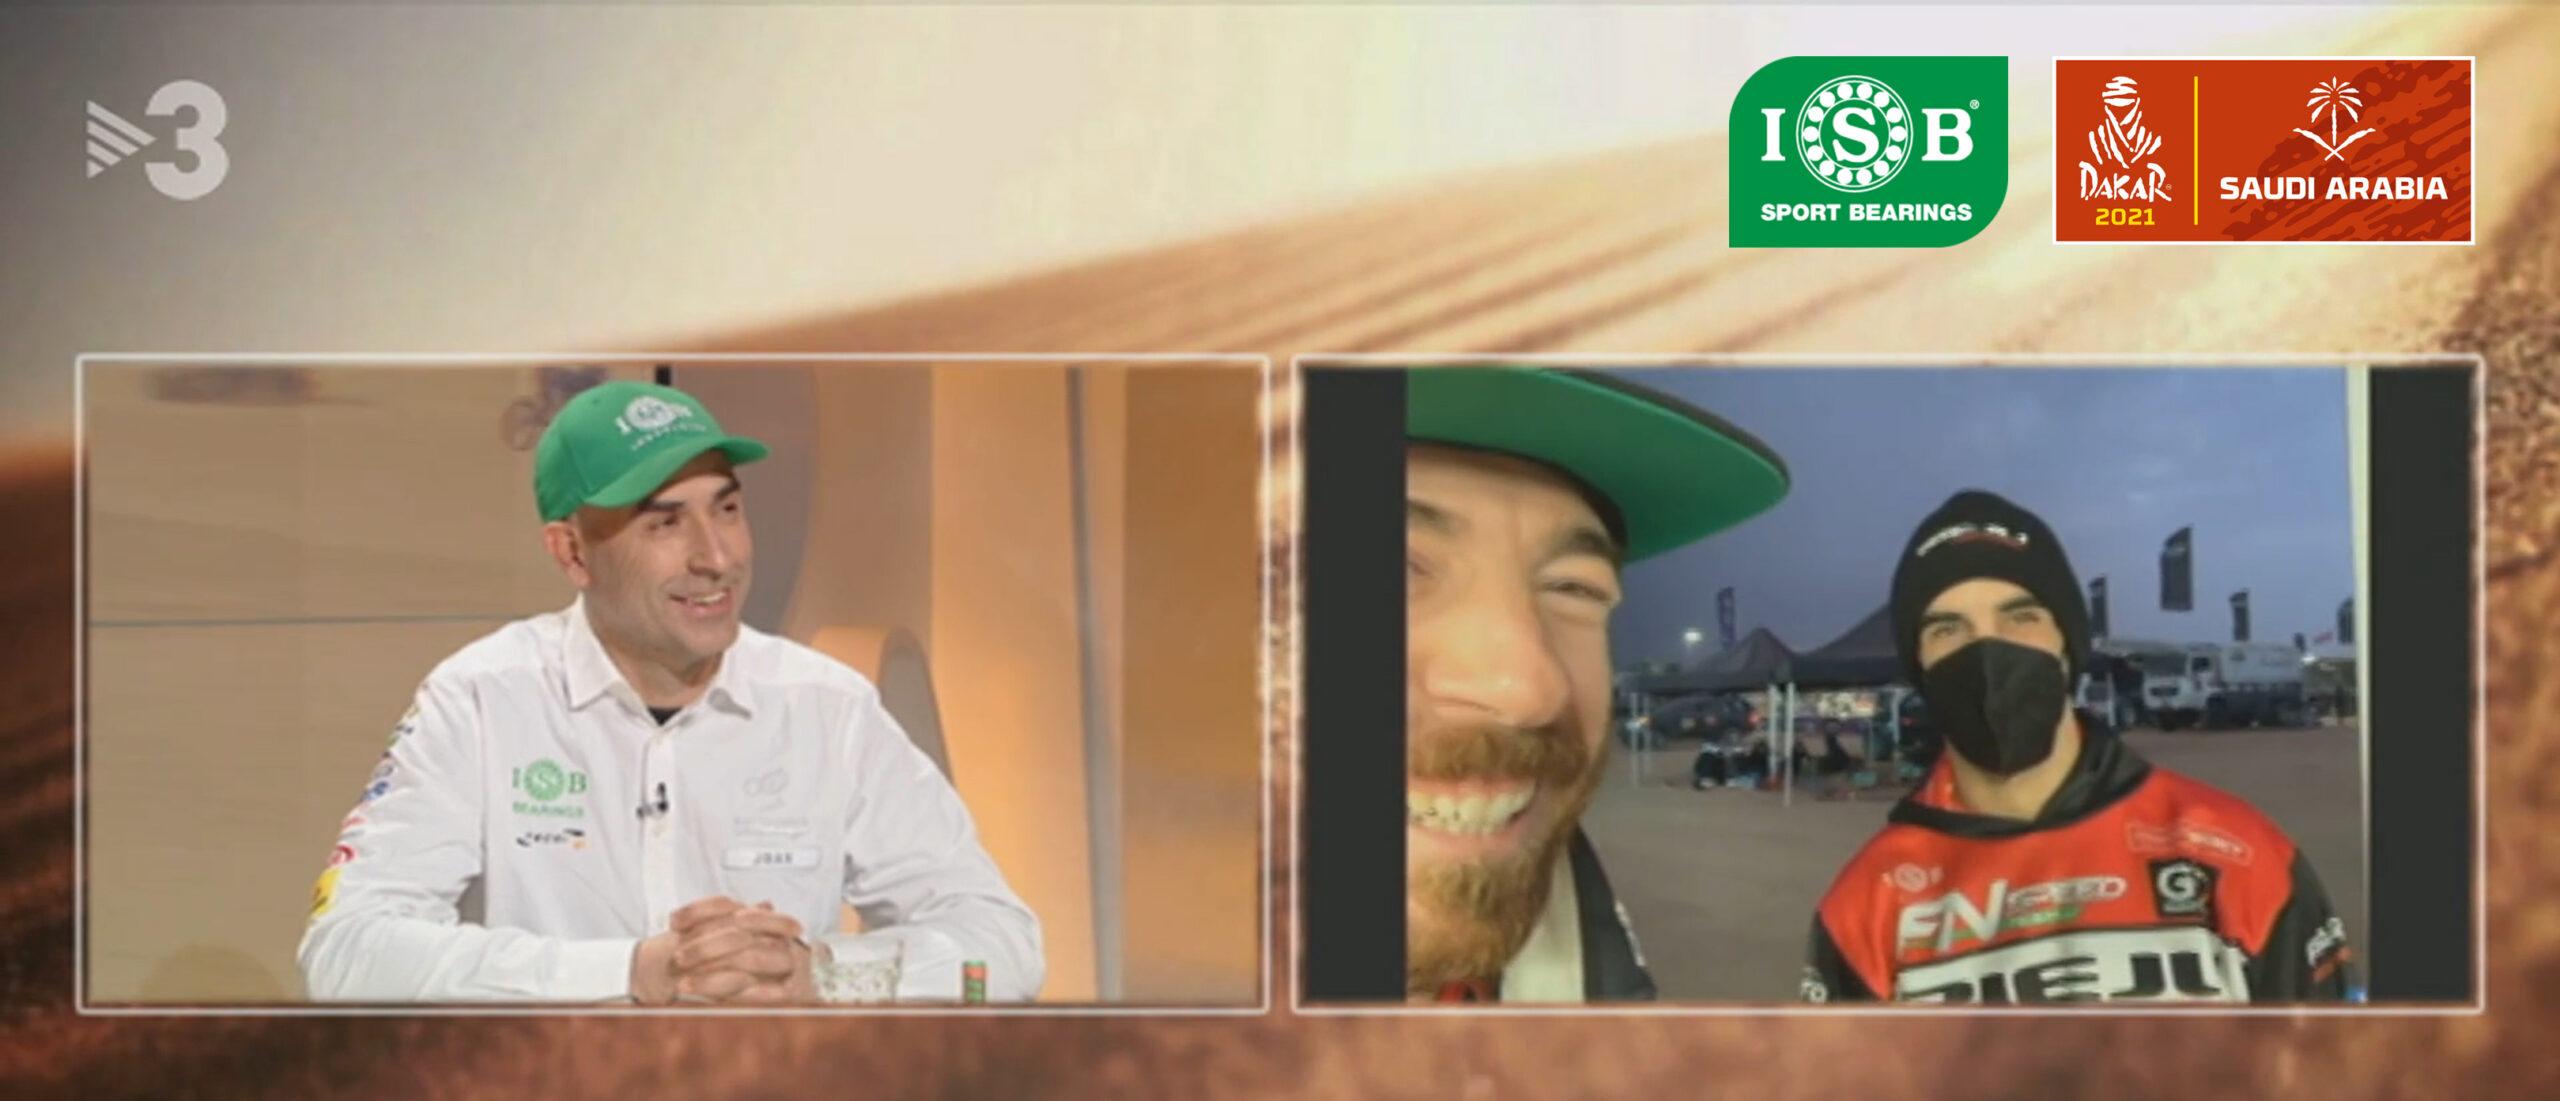 ISB Sport Joan Tavi Dakar TV3